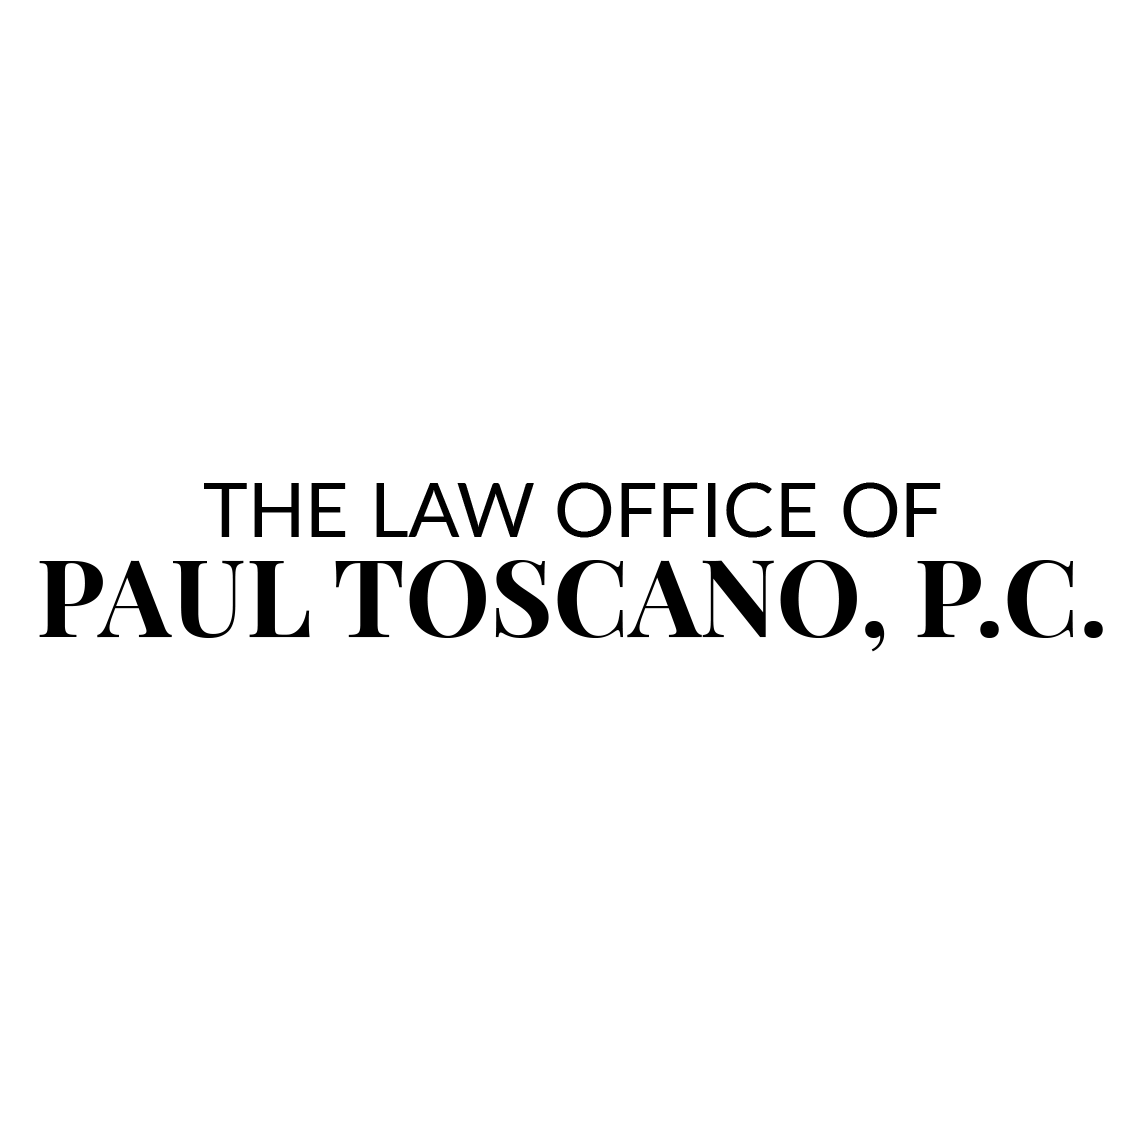 The Law Office of Paul Toscano, P.C. - Salt Lake City, UT - Attorneys